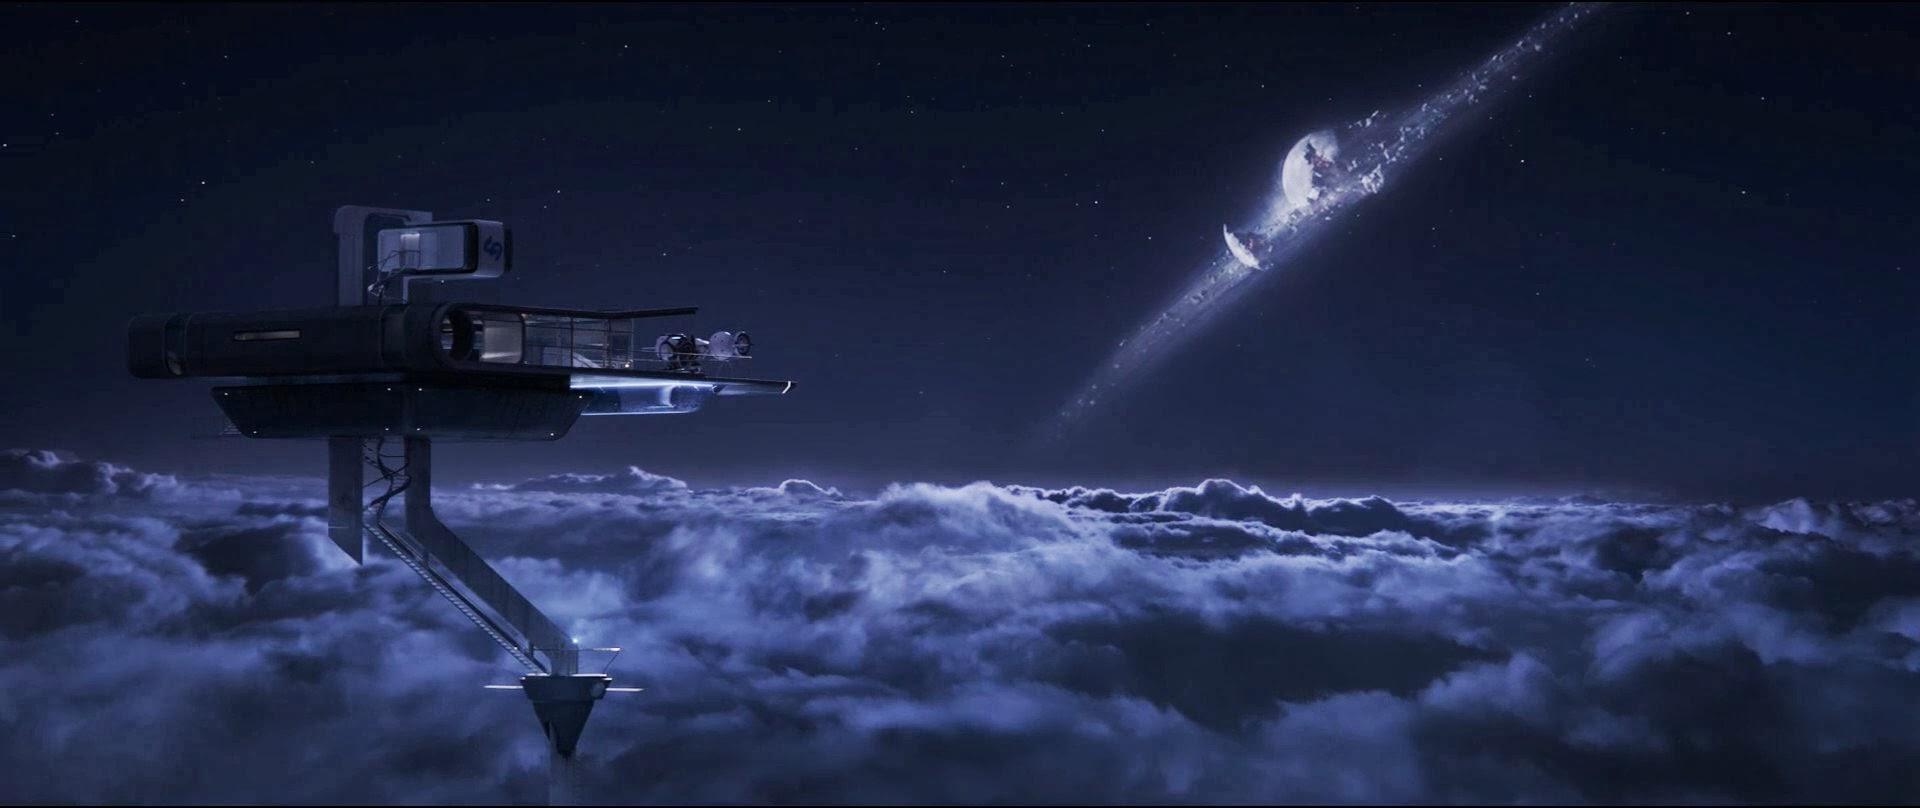 Oblivion (2013) BluRay 1080p 5.1CH x264 Ganool_0005